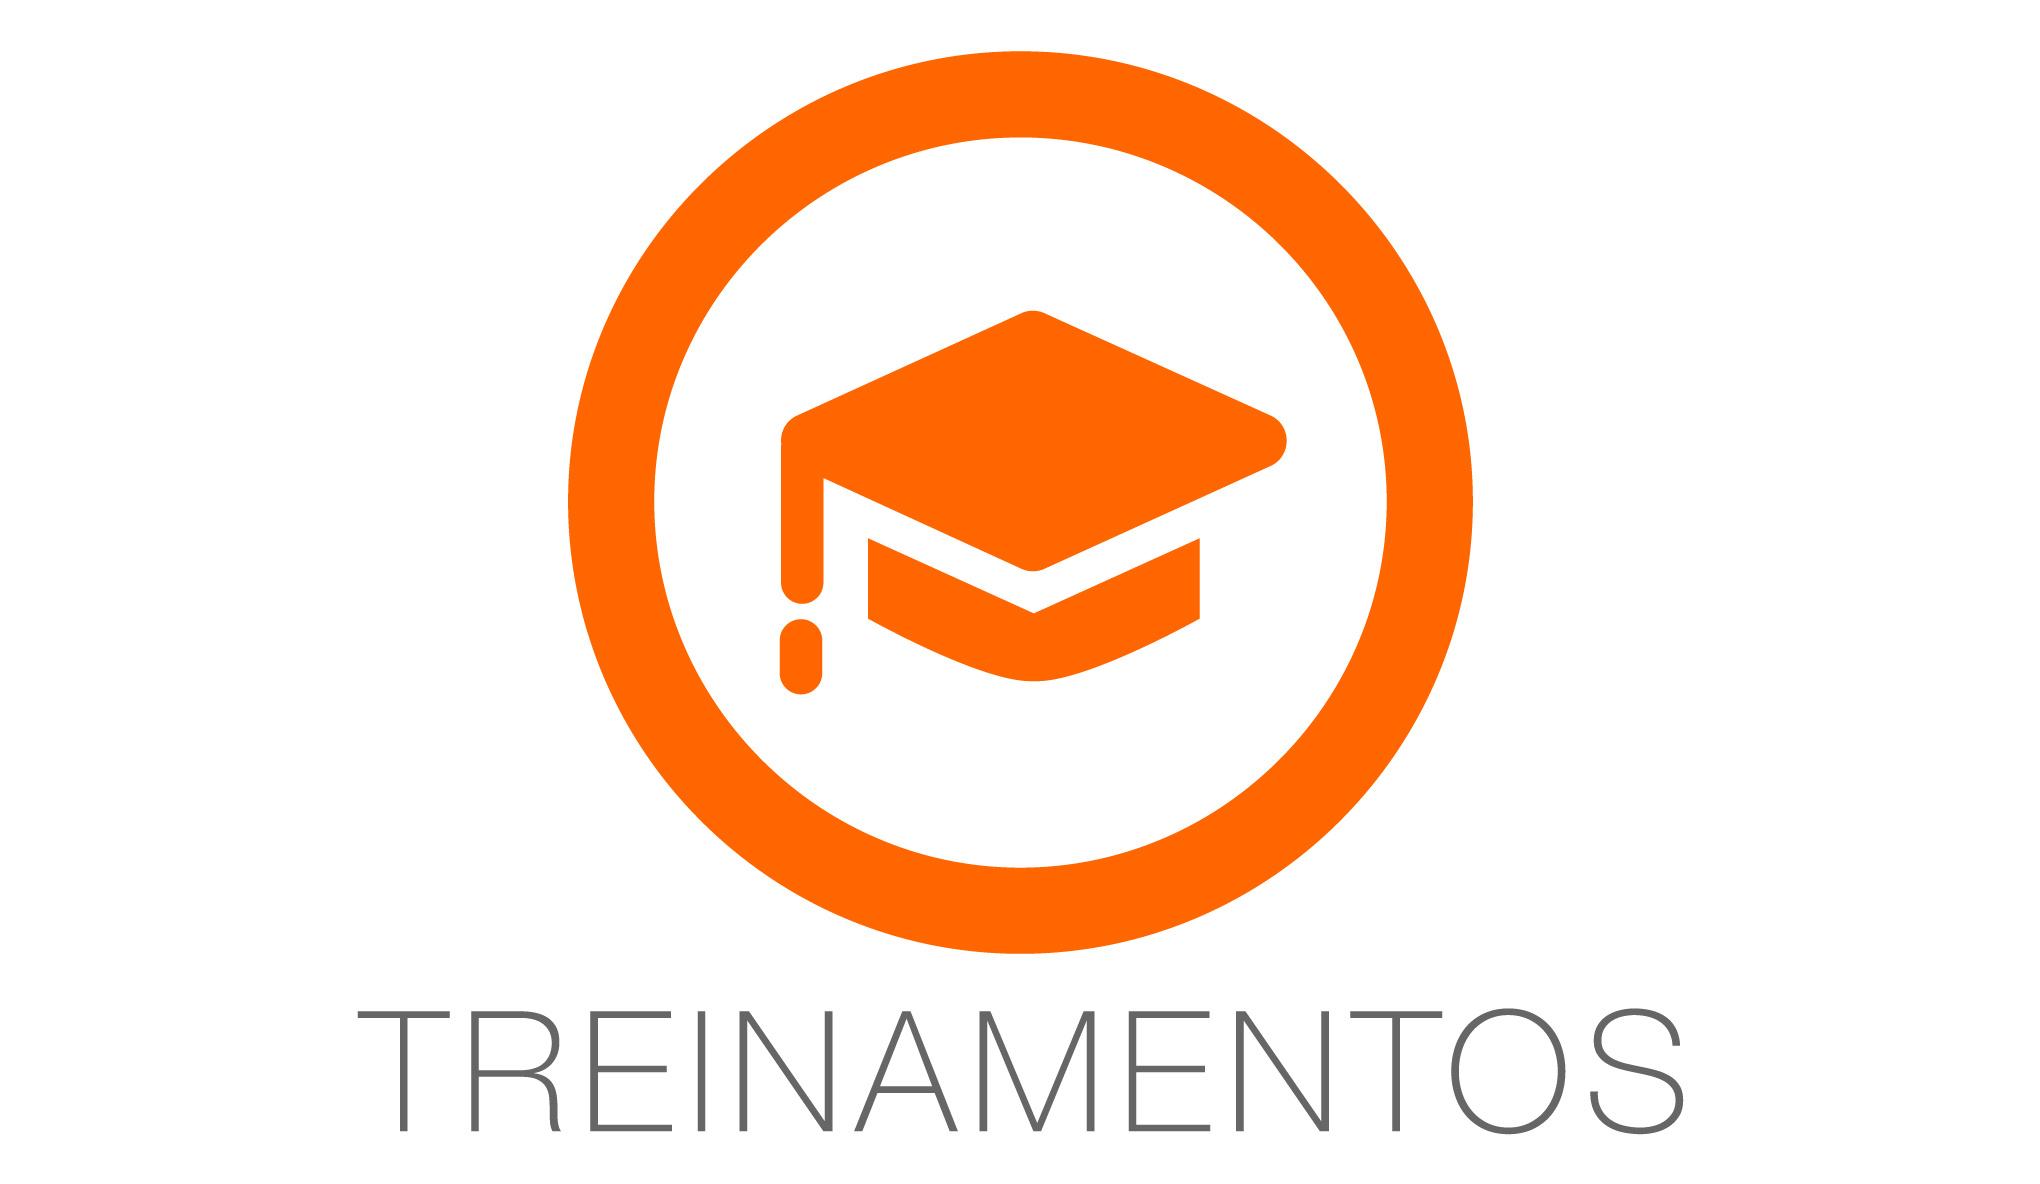 https://0201.nccdn.net/1_2/000/000/08f/ac8/treinamentos-2040x1184.jpg